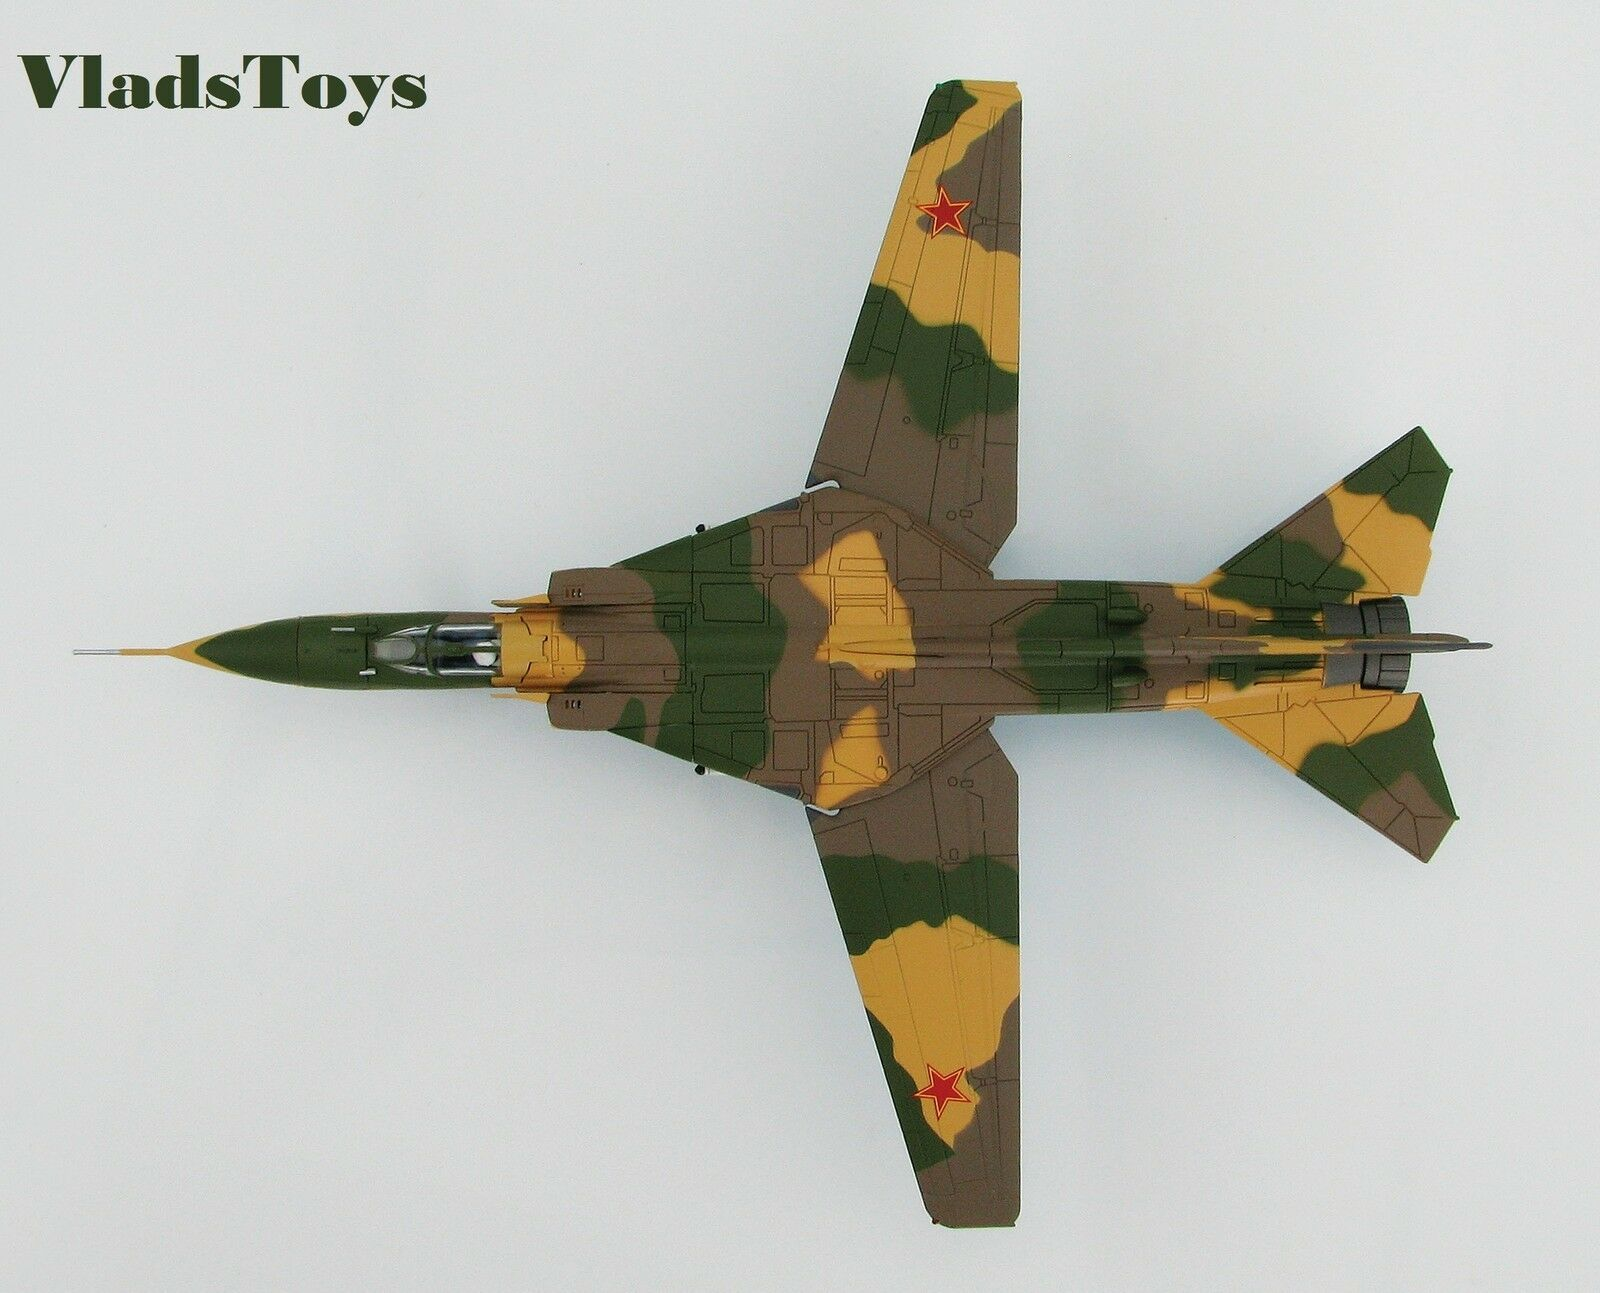 Hobby Master 1:72 MiG-23MS Flogger rosso 49 USAF 4477th Test Evaluation Sqn HA5303